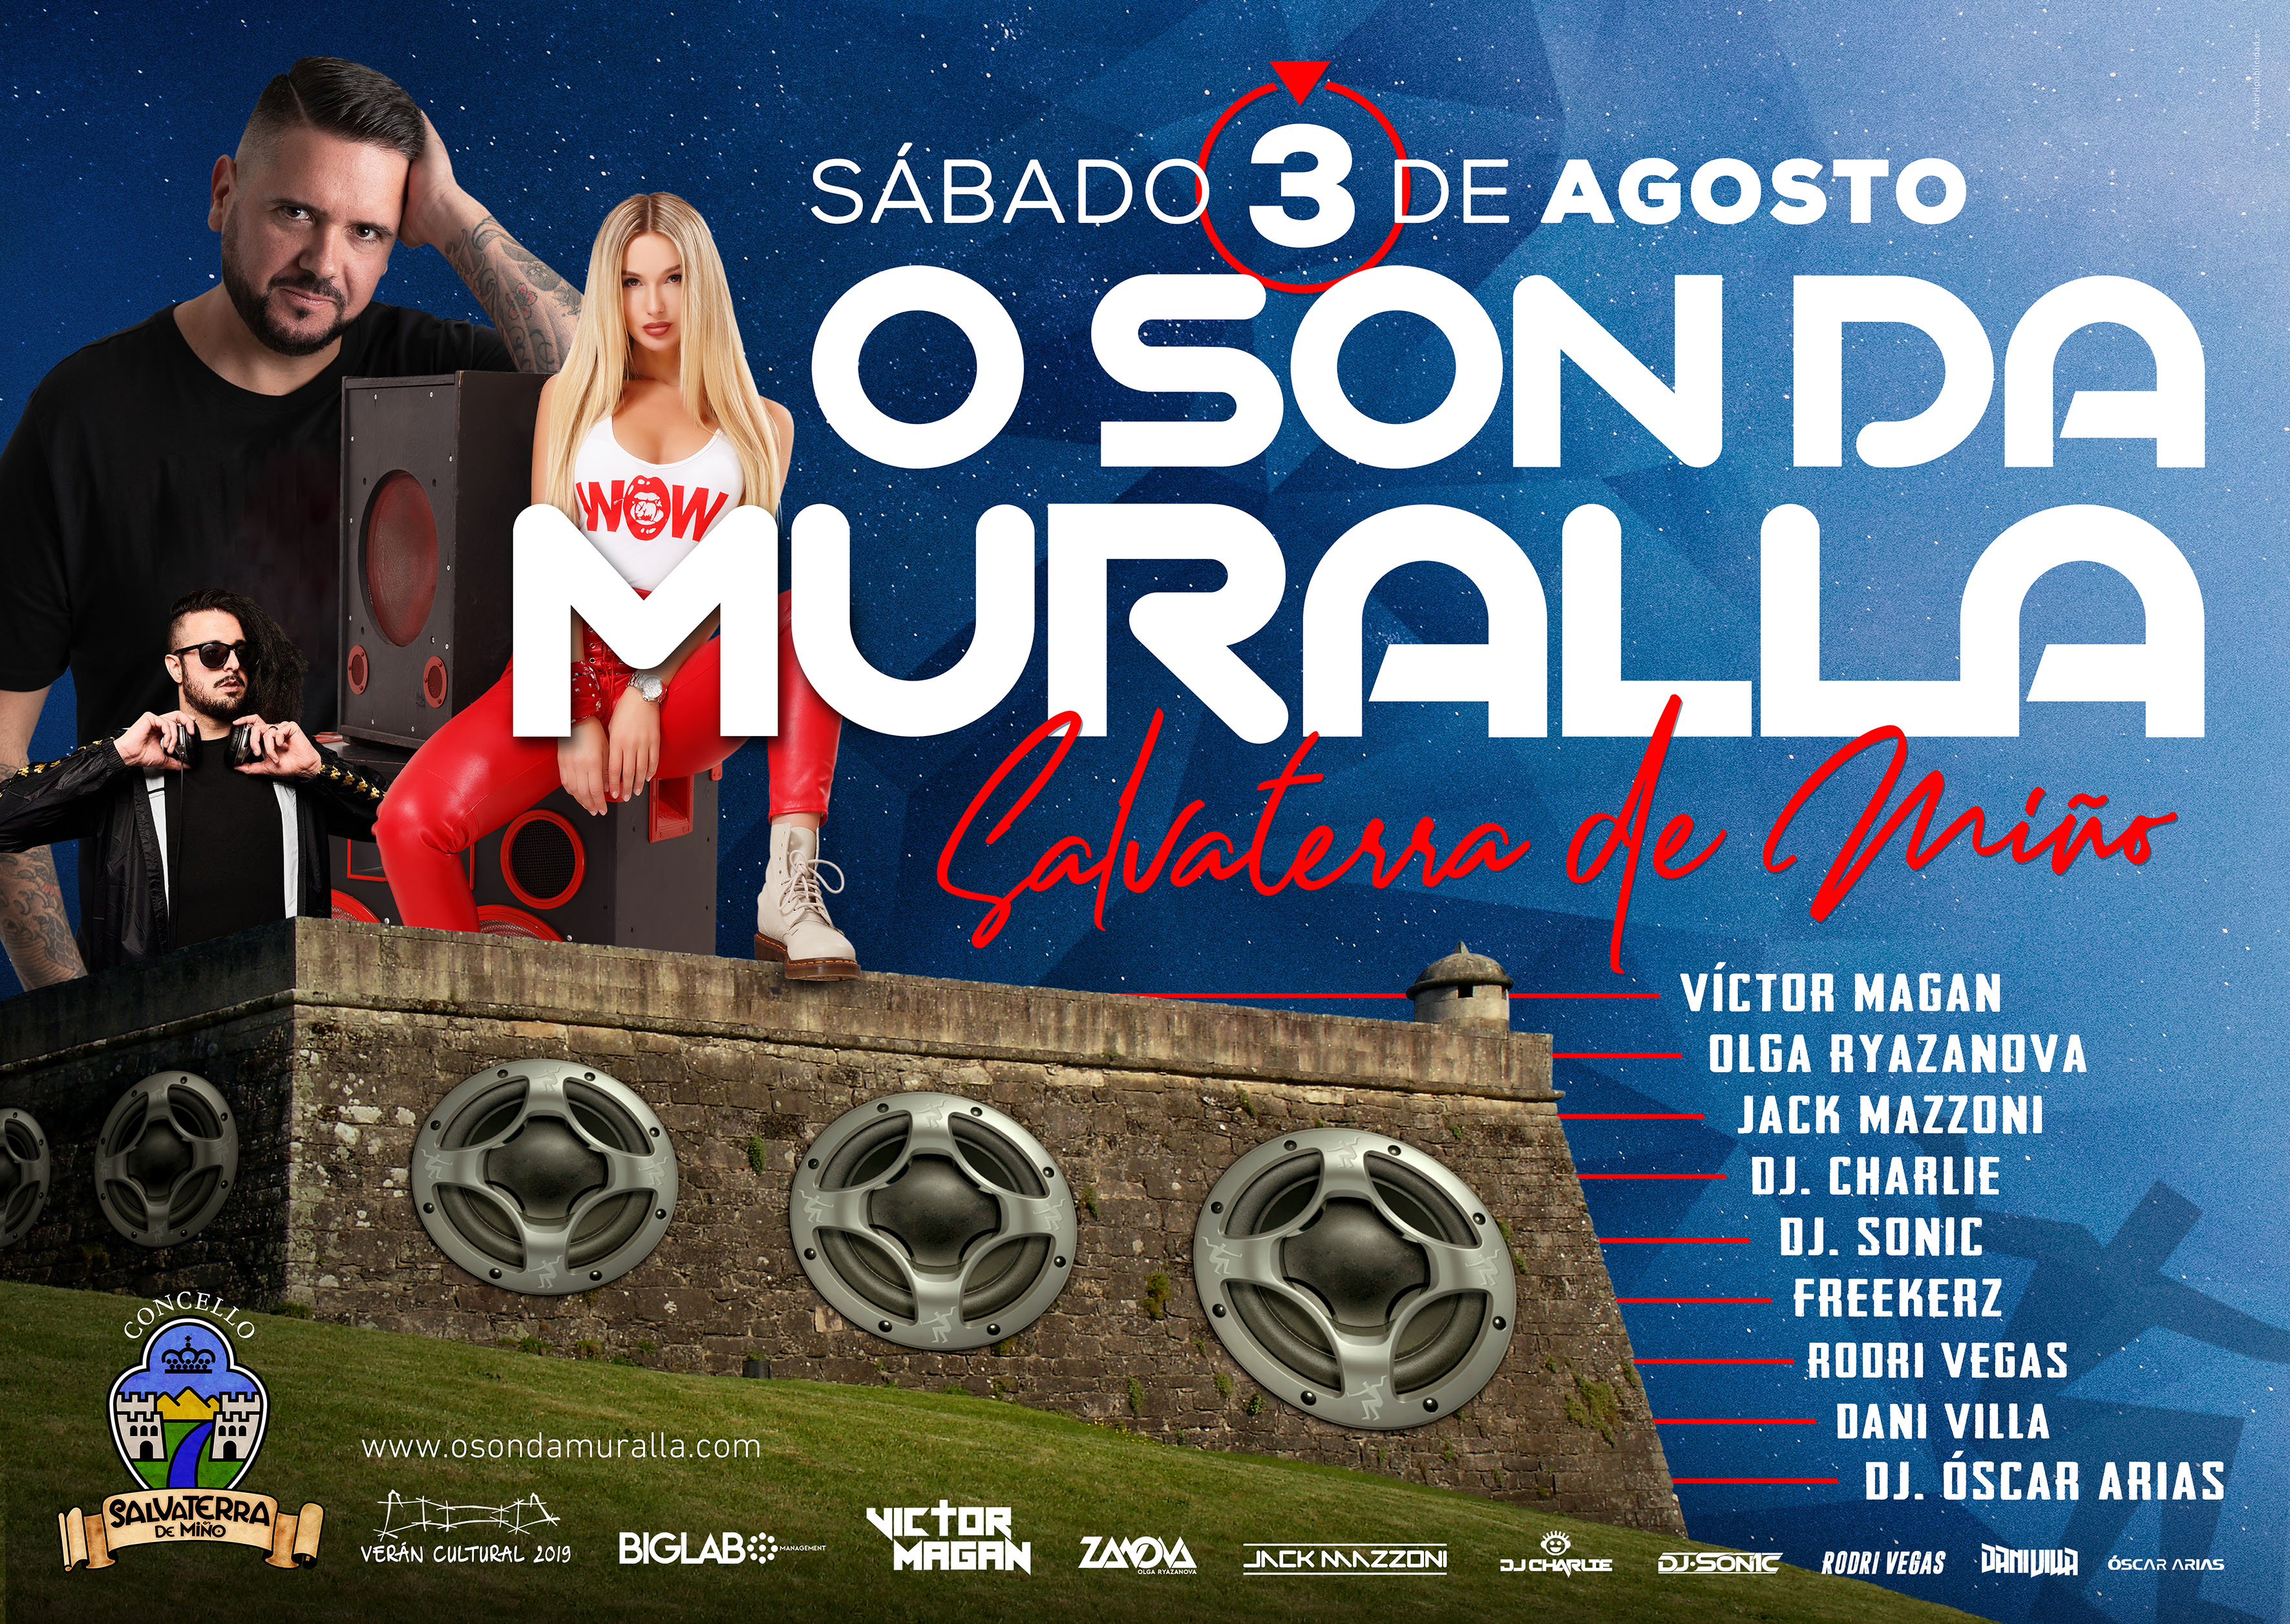 03-08-2019-O-Son-da-muralla-DEFINITIVO